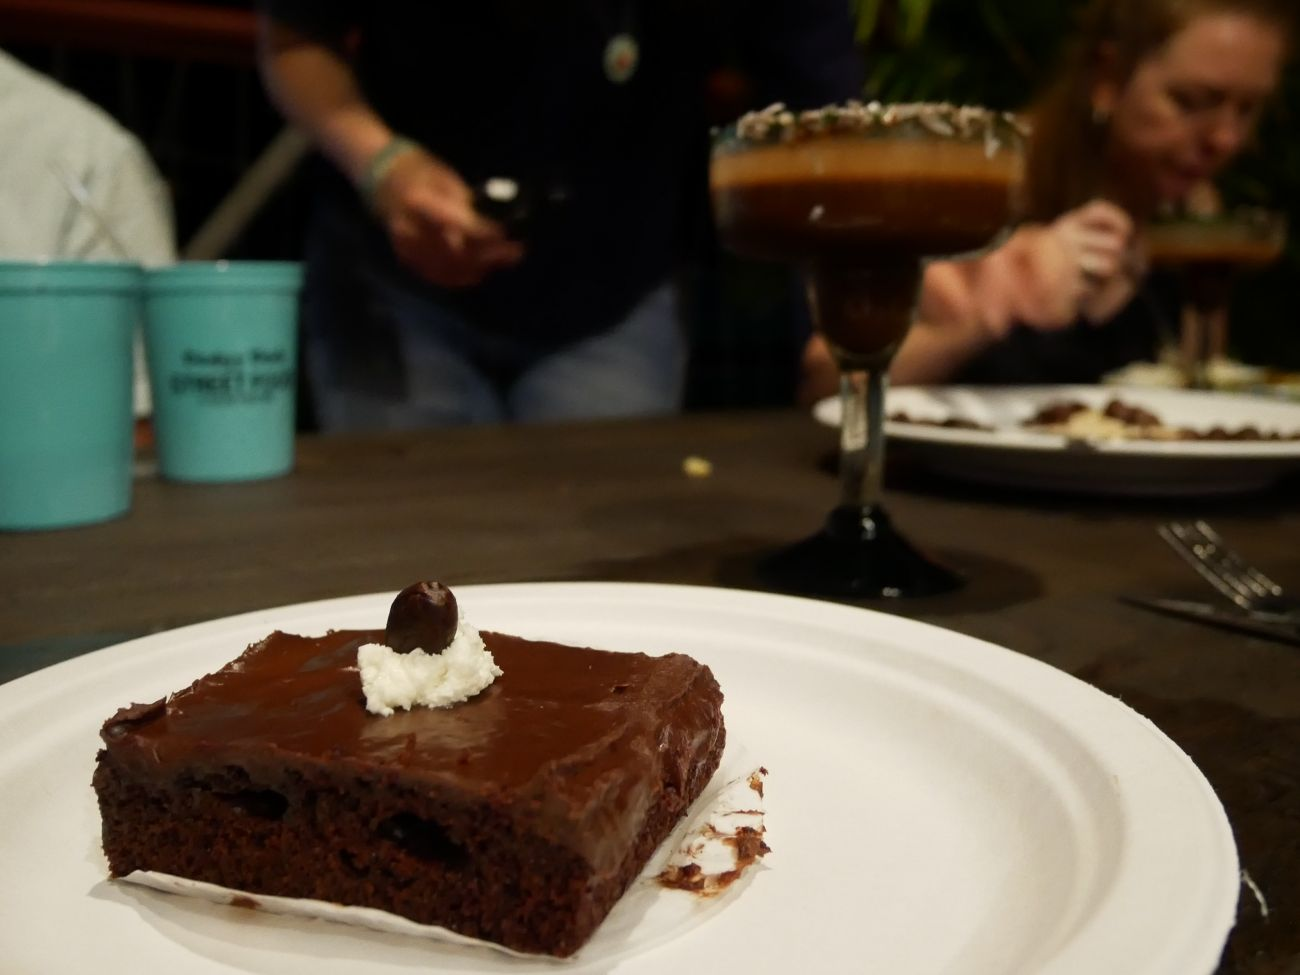 Chocolate cake and chocolate martini